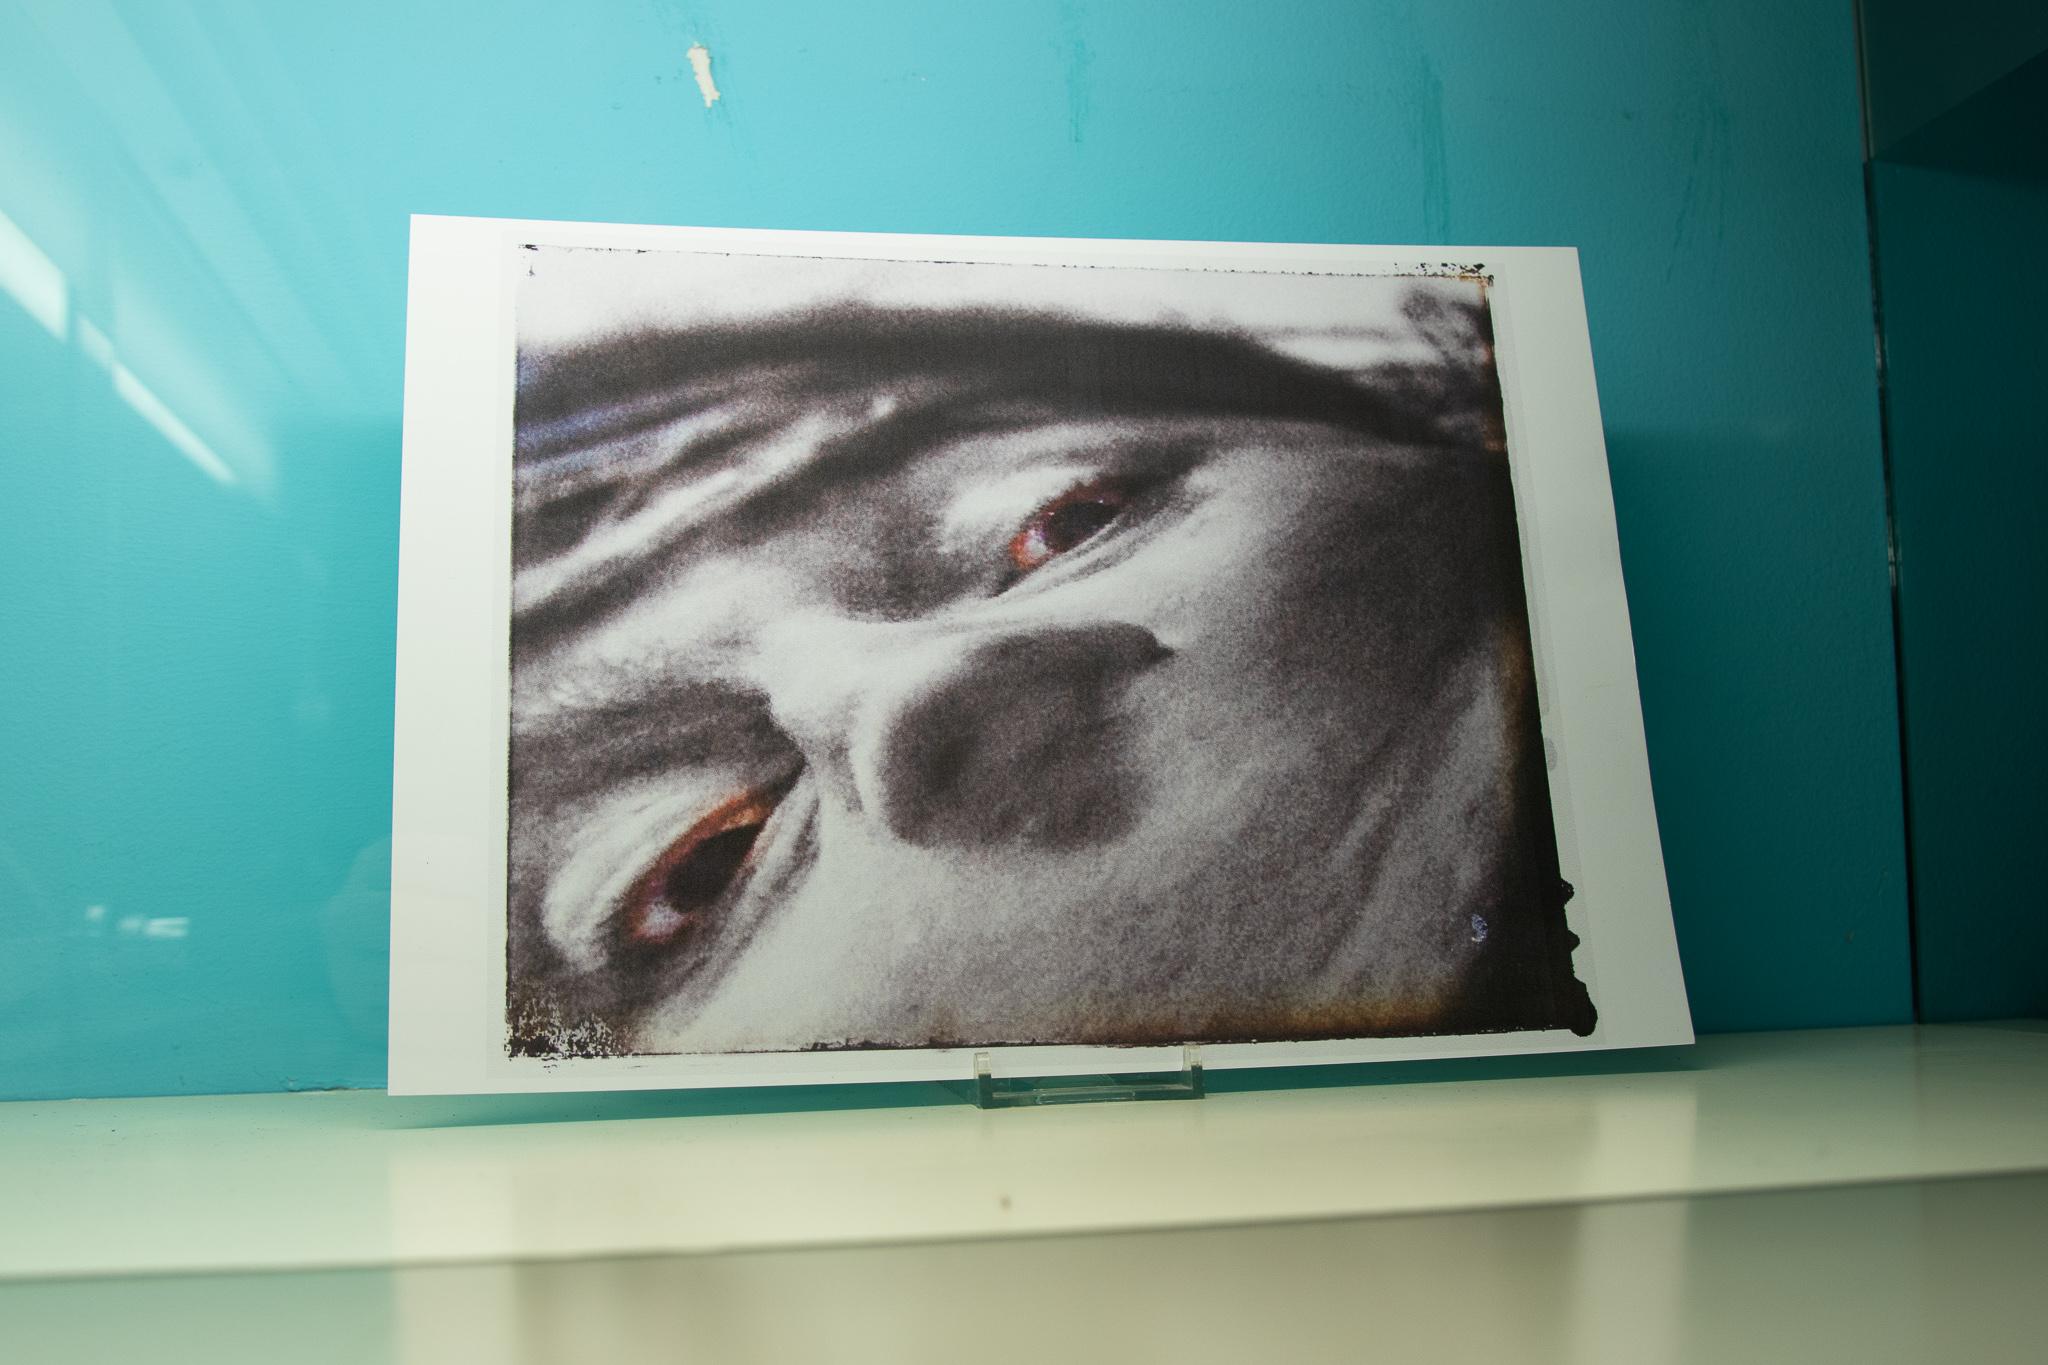 Photograph of a face, close up